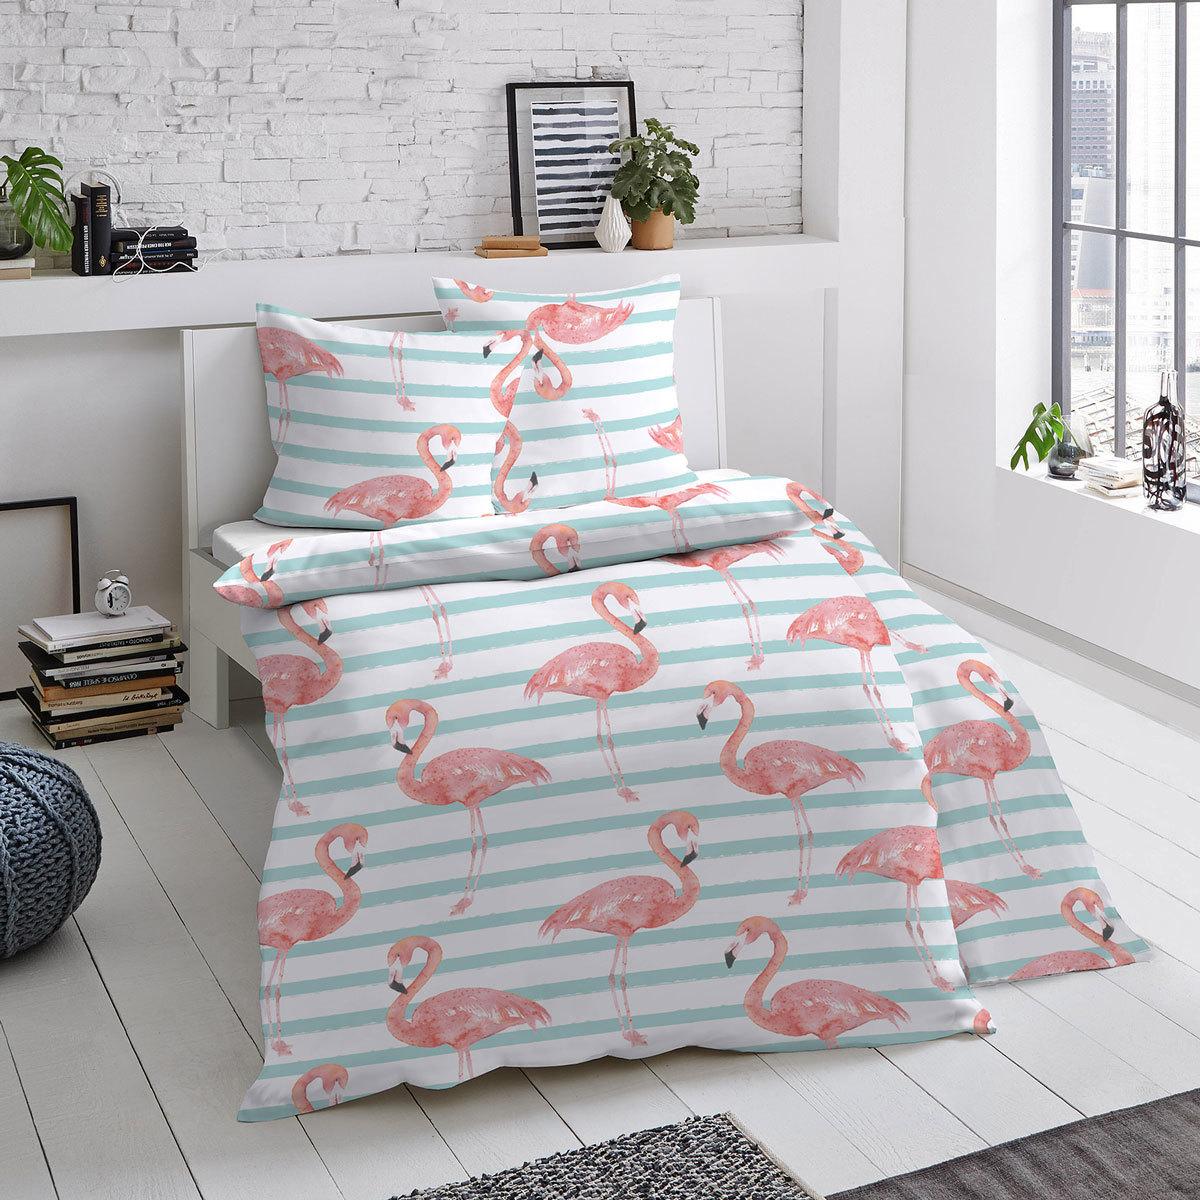 dormisette mako satin bettw sche flamingo hausrobinson. Black Bedroom Furniture Sets. Home Design Ideas